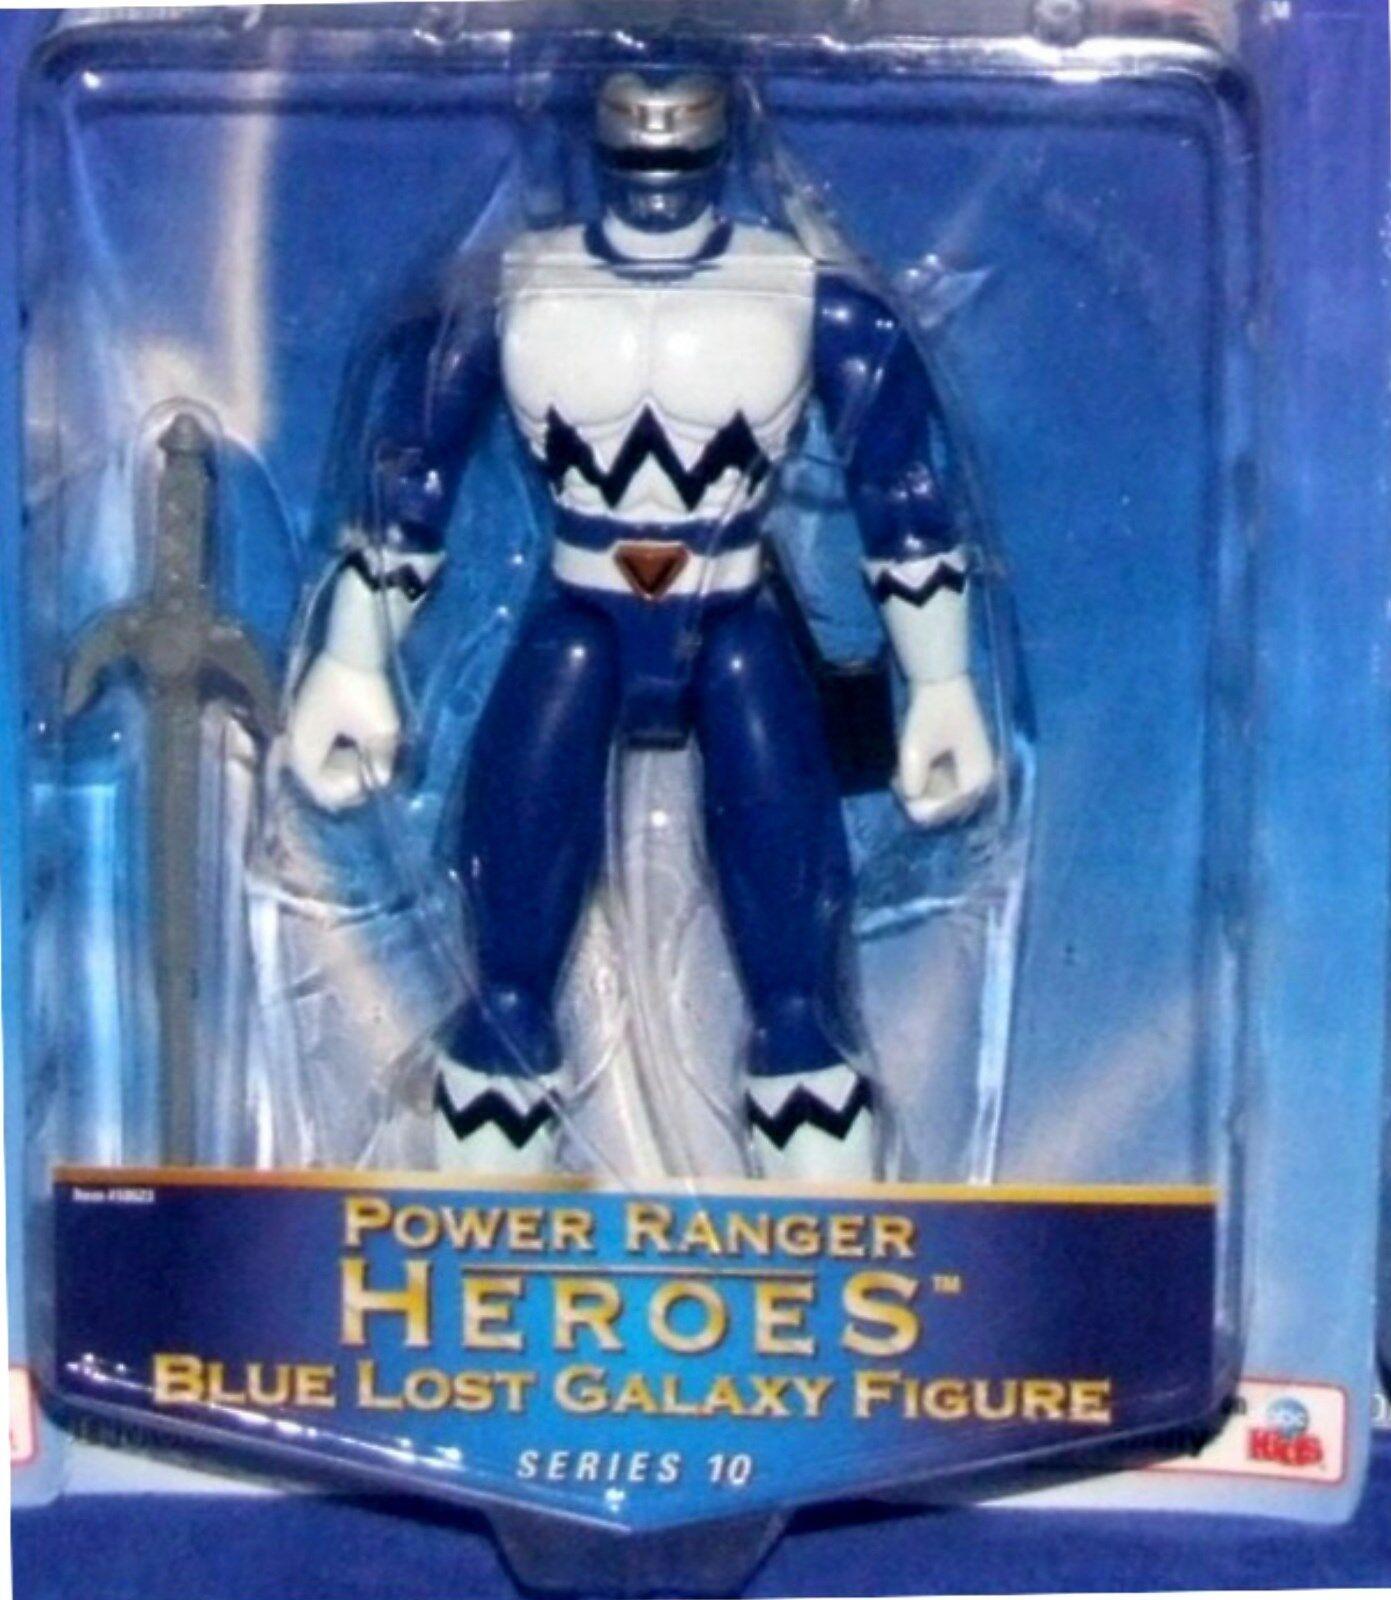 Energia Rangers Lost  Galaxy 5  blu Ranger Heroes Series 10 nuovo Factory Seal 2003  al prezzo più basso